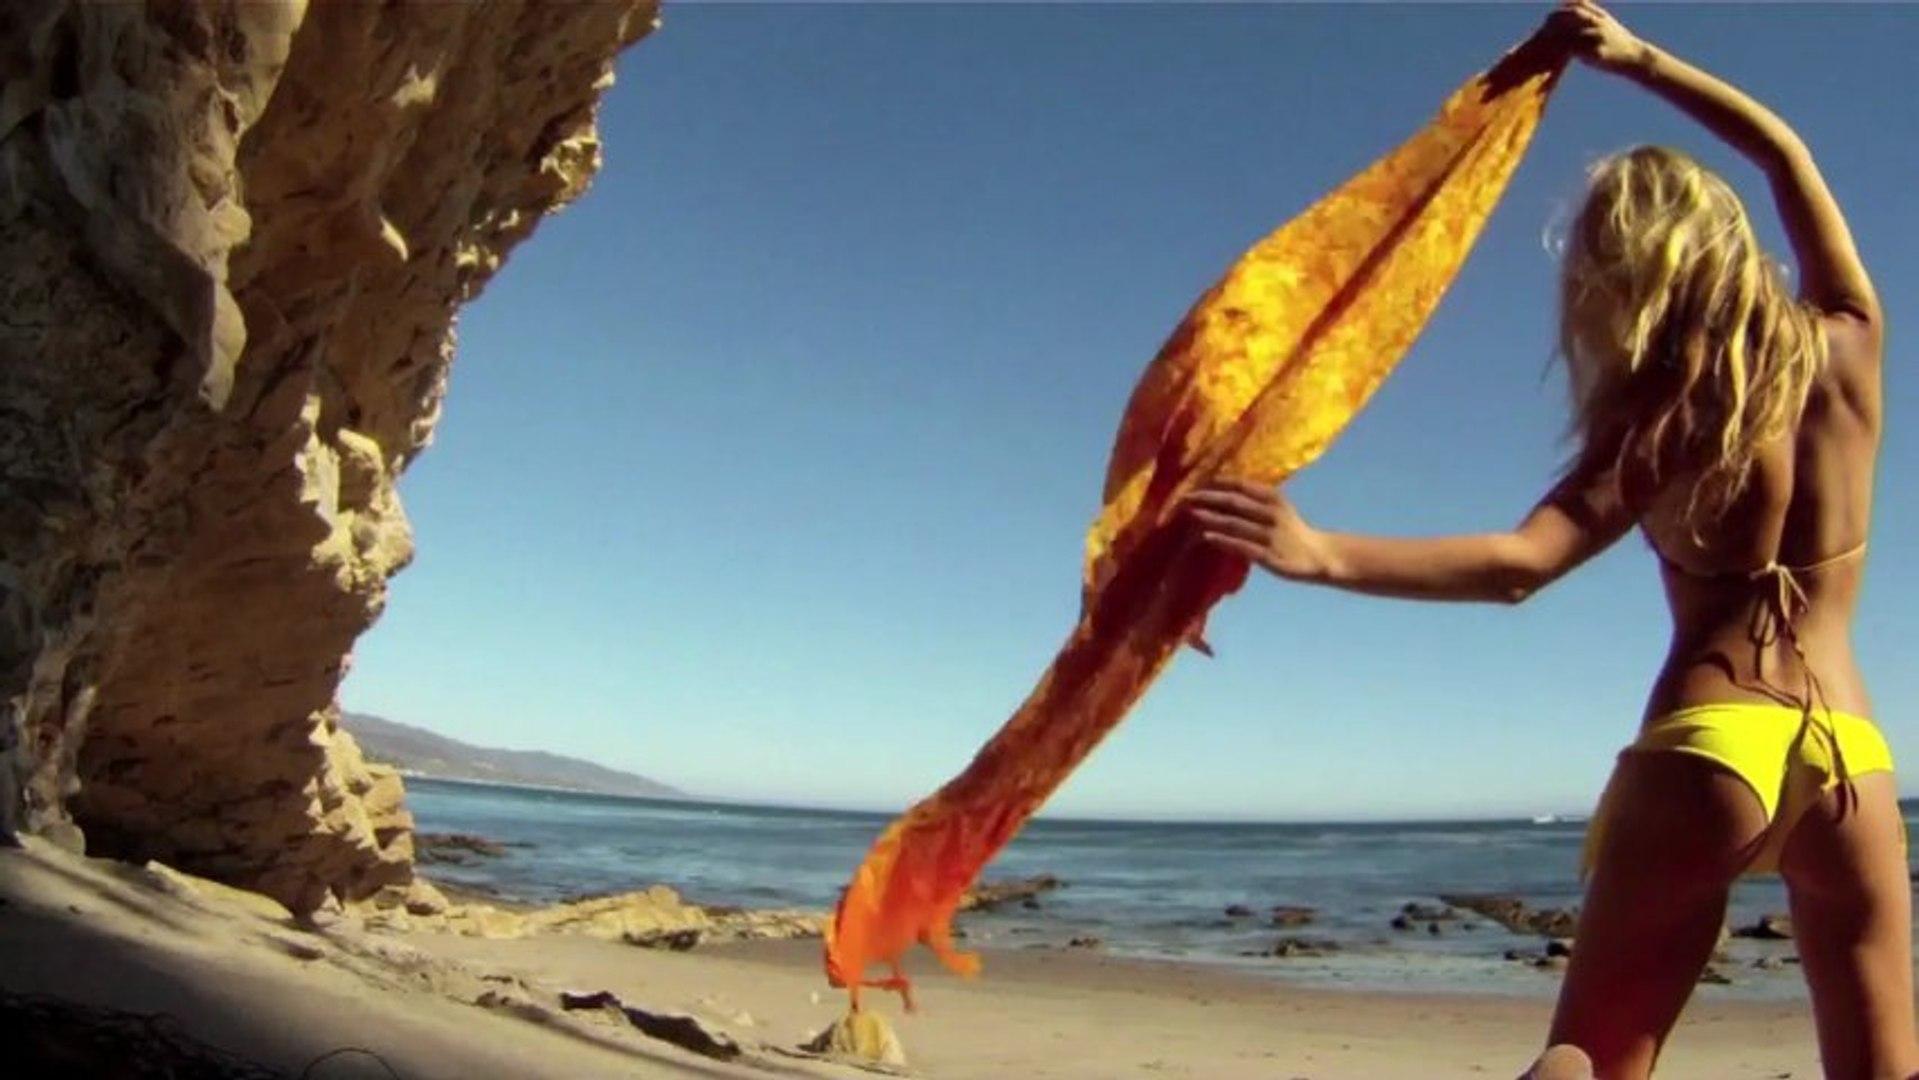 Best bikini HD Video Compilation EVER MADE!! Viva la HD ;-)